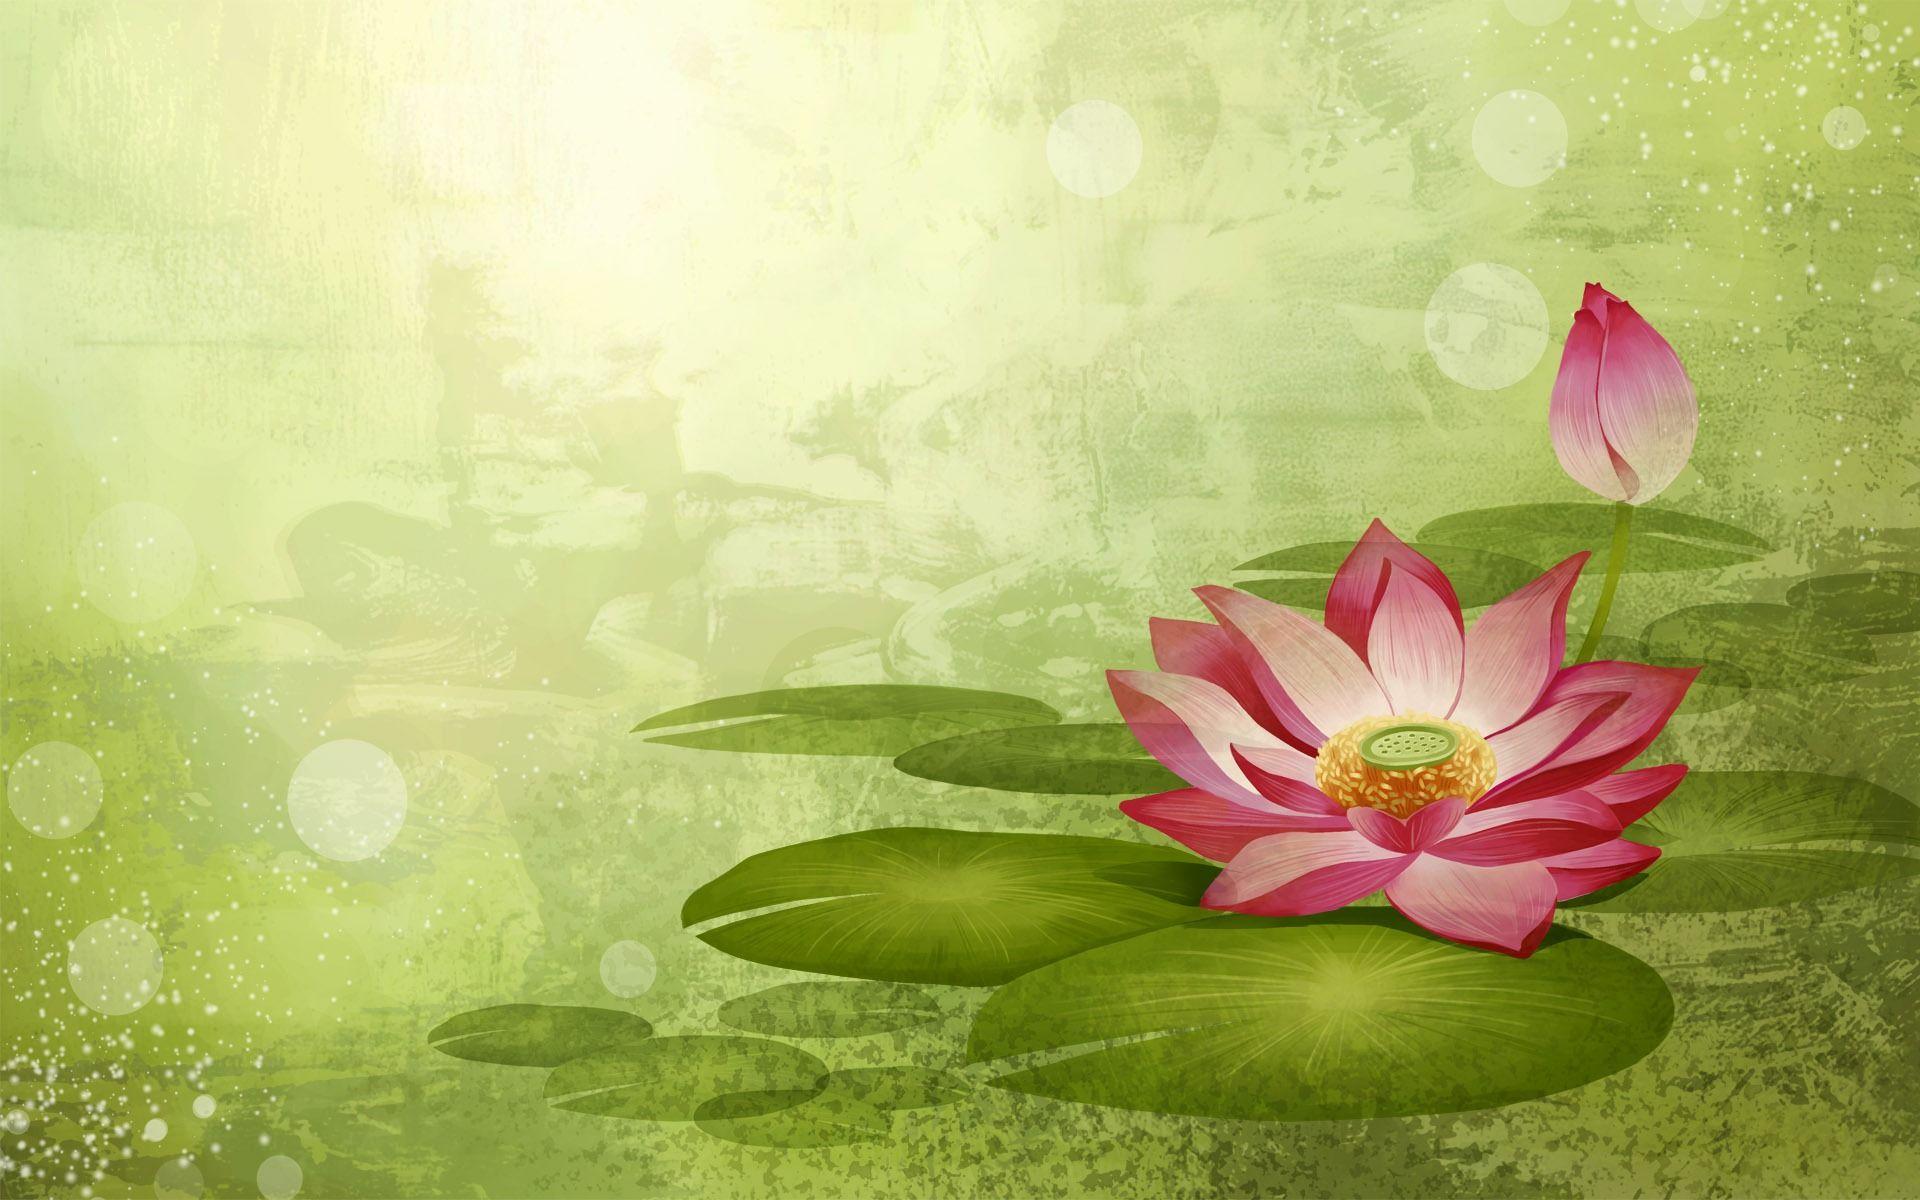 Pin by lyne sena on backgrounds pinterest flower backgrounds